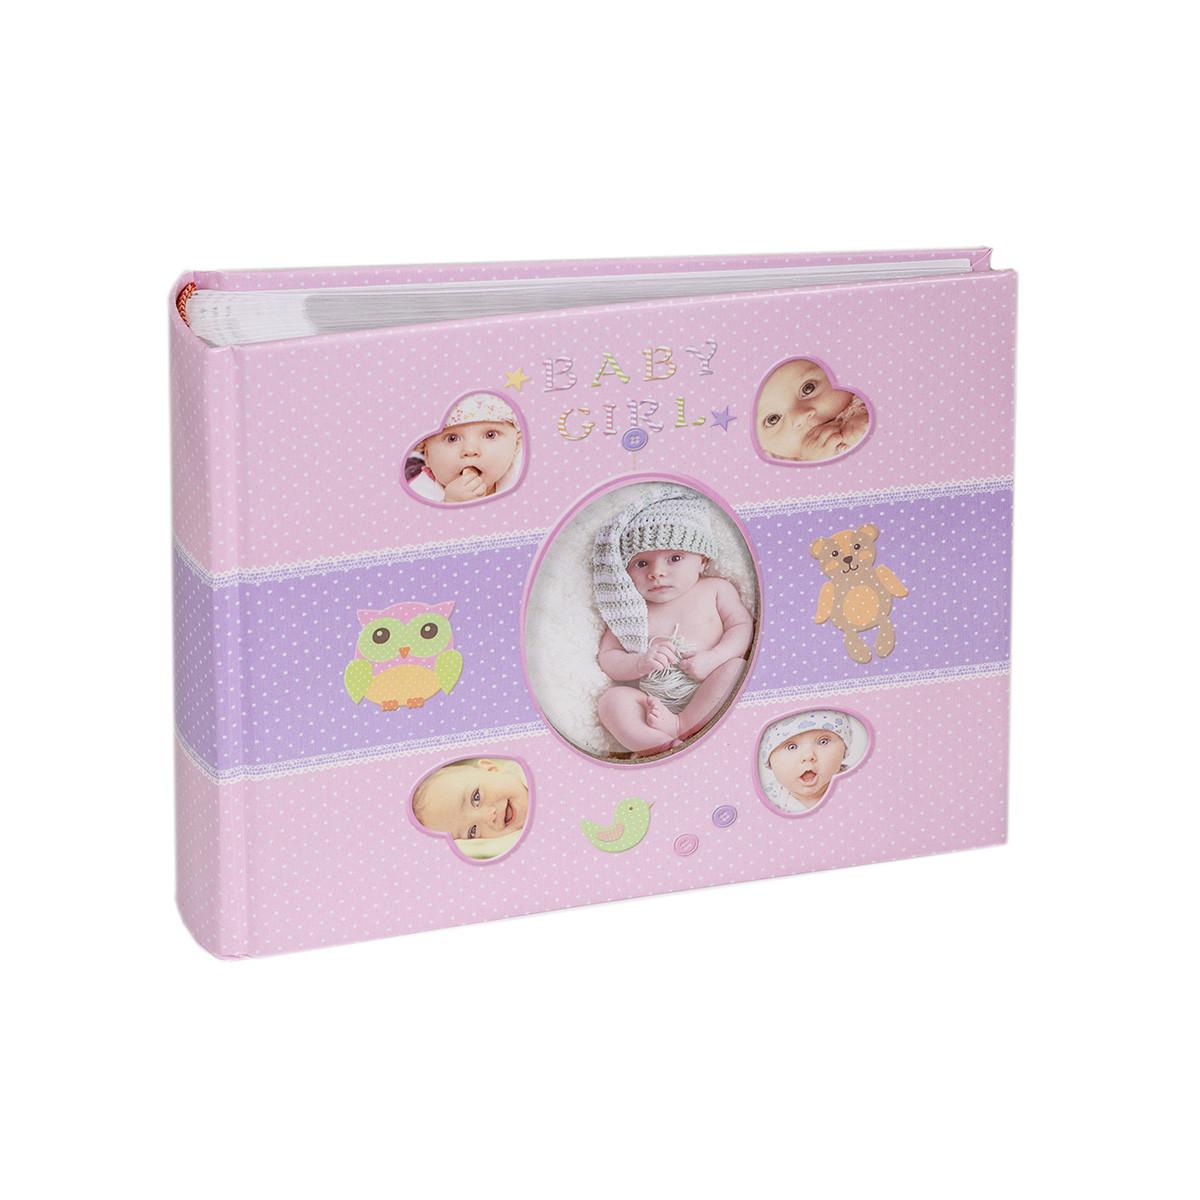 Альбом CHAKO 10*15/100 7061409-100 Babylove рожевий